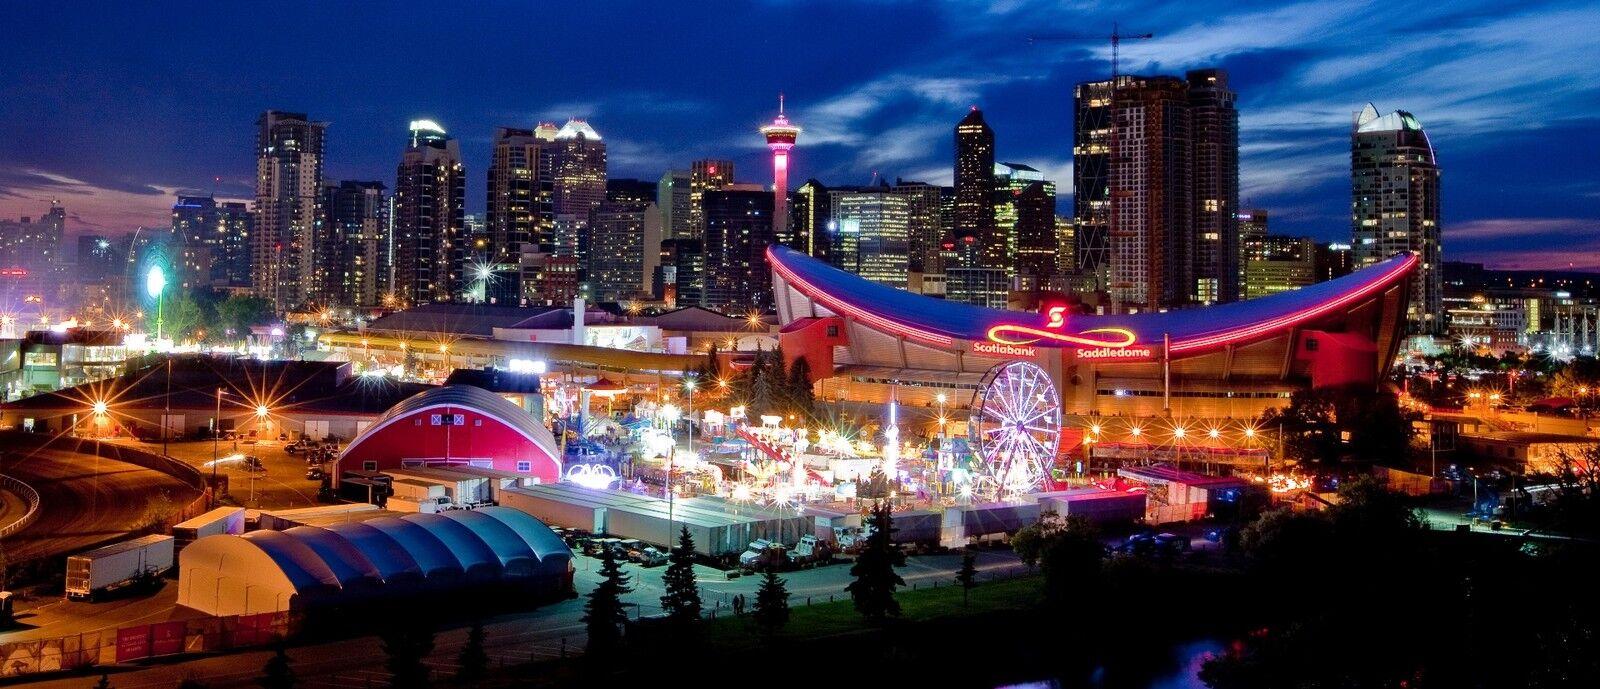 Calgary Stampede Rodeo 7 5 2019 Tickets Stubhub